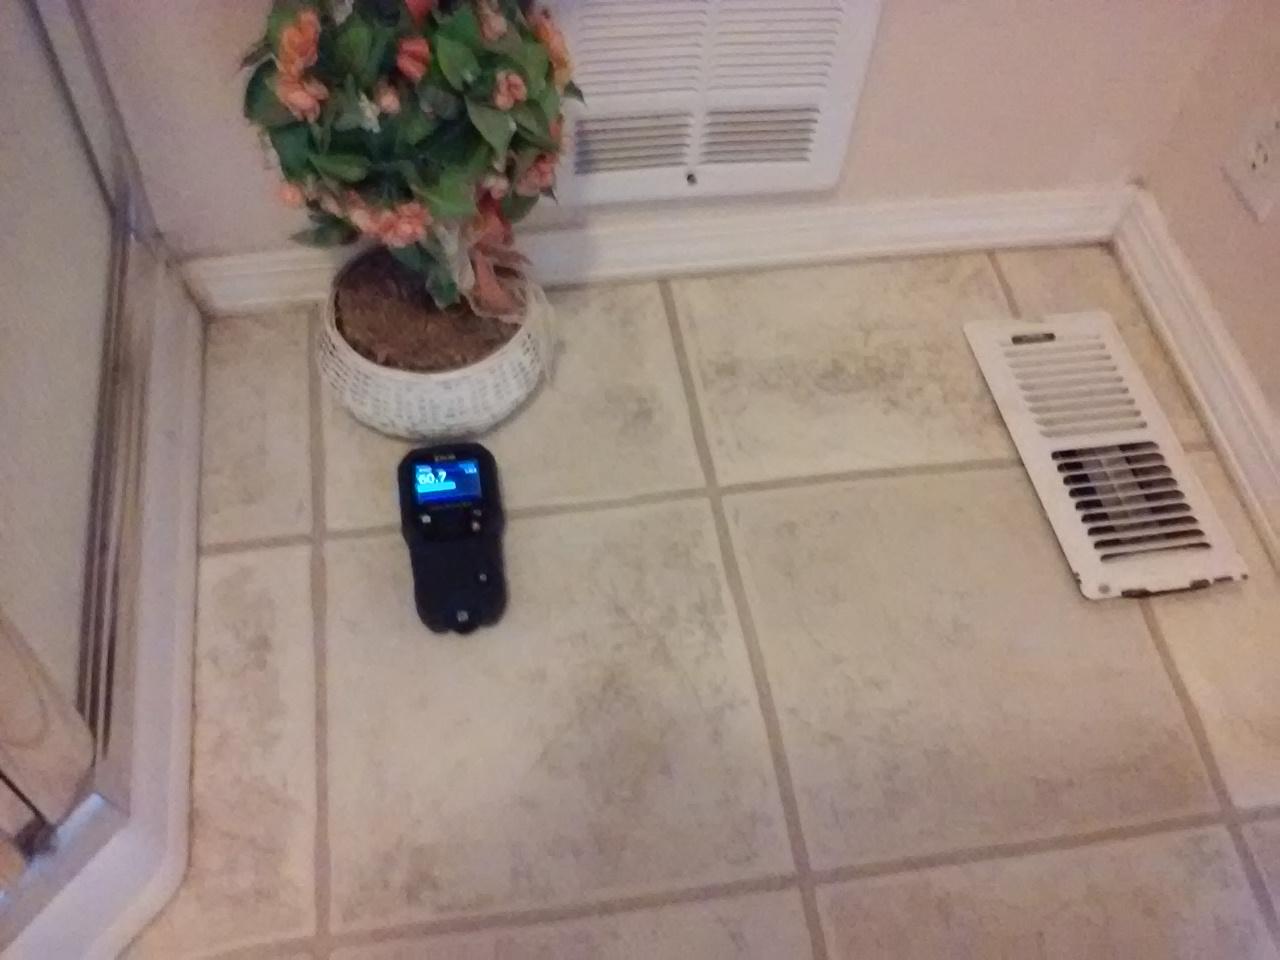 Moisture meter identify water